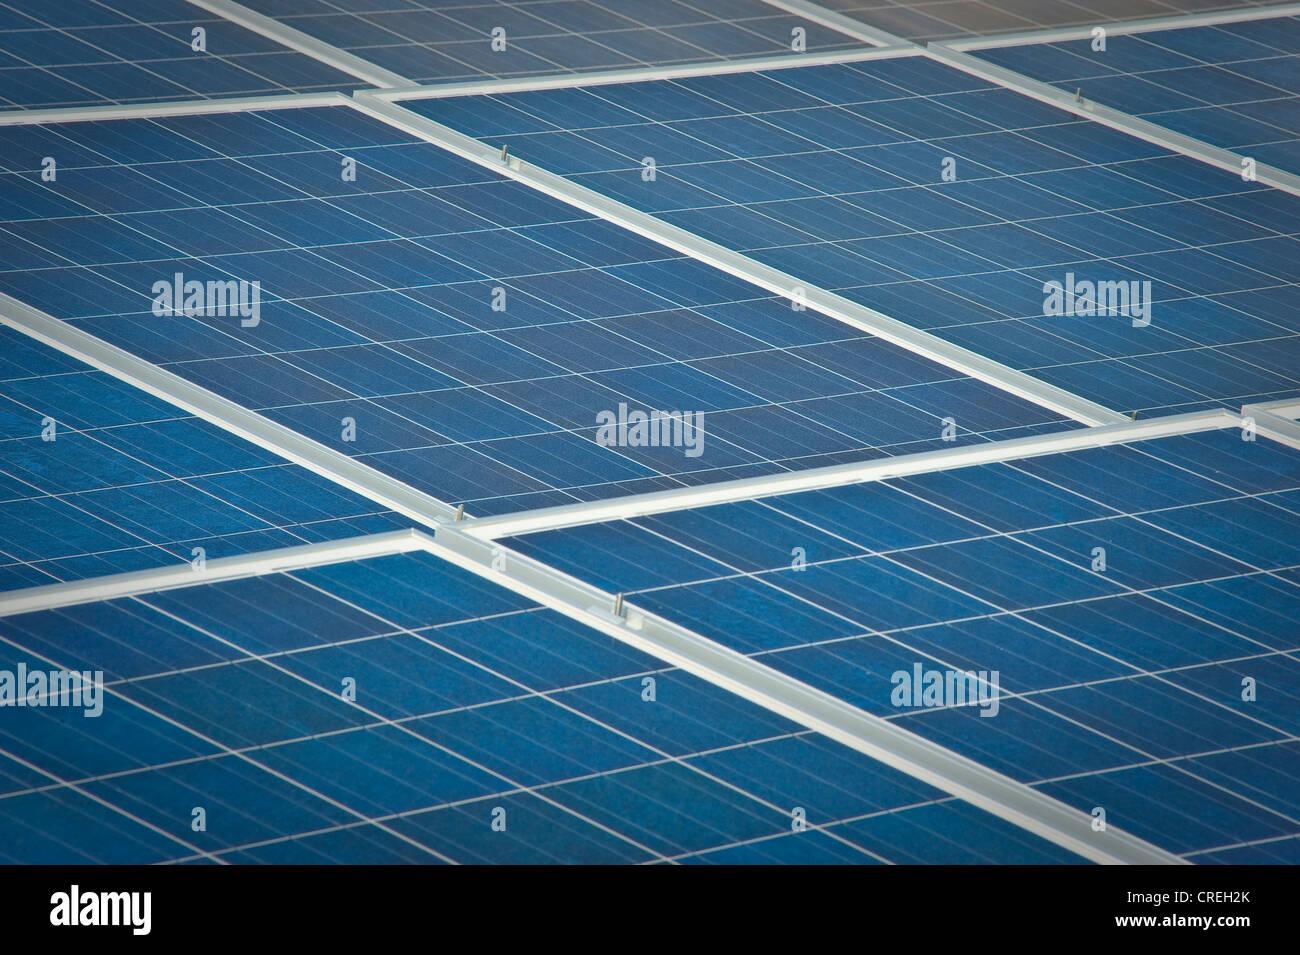 Solar Panels Detail - Stock Image